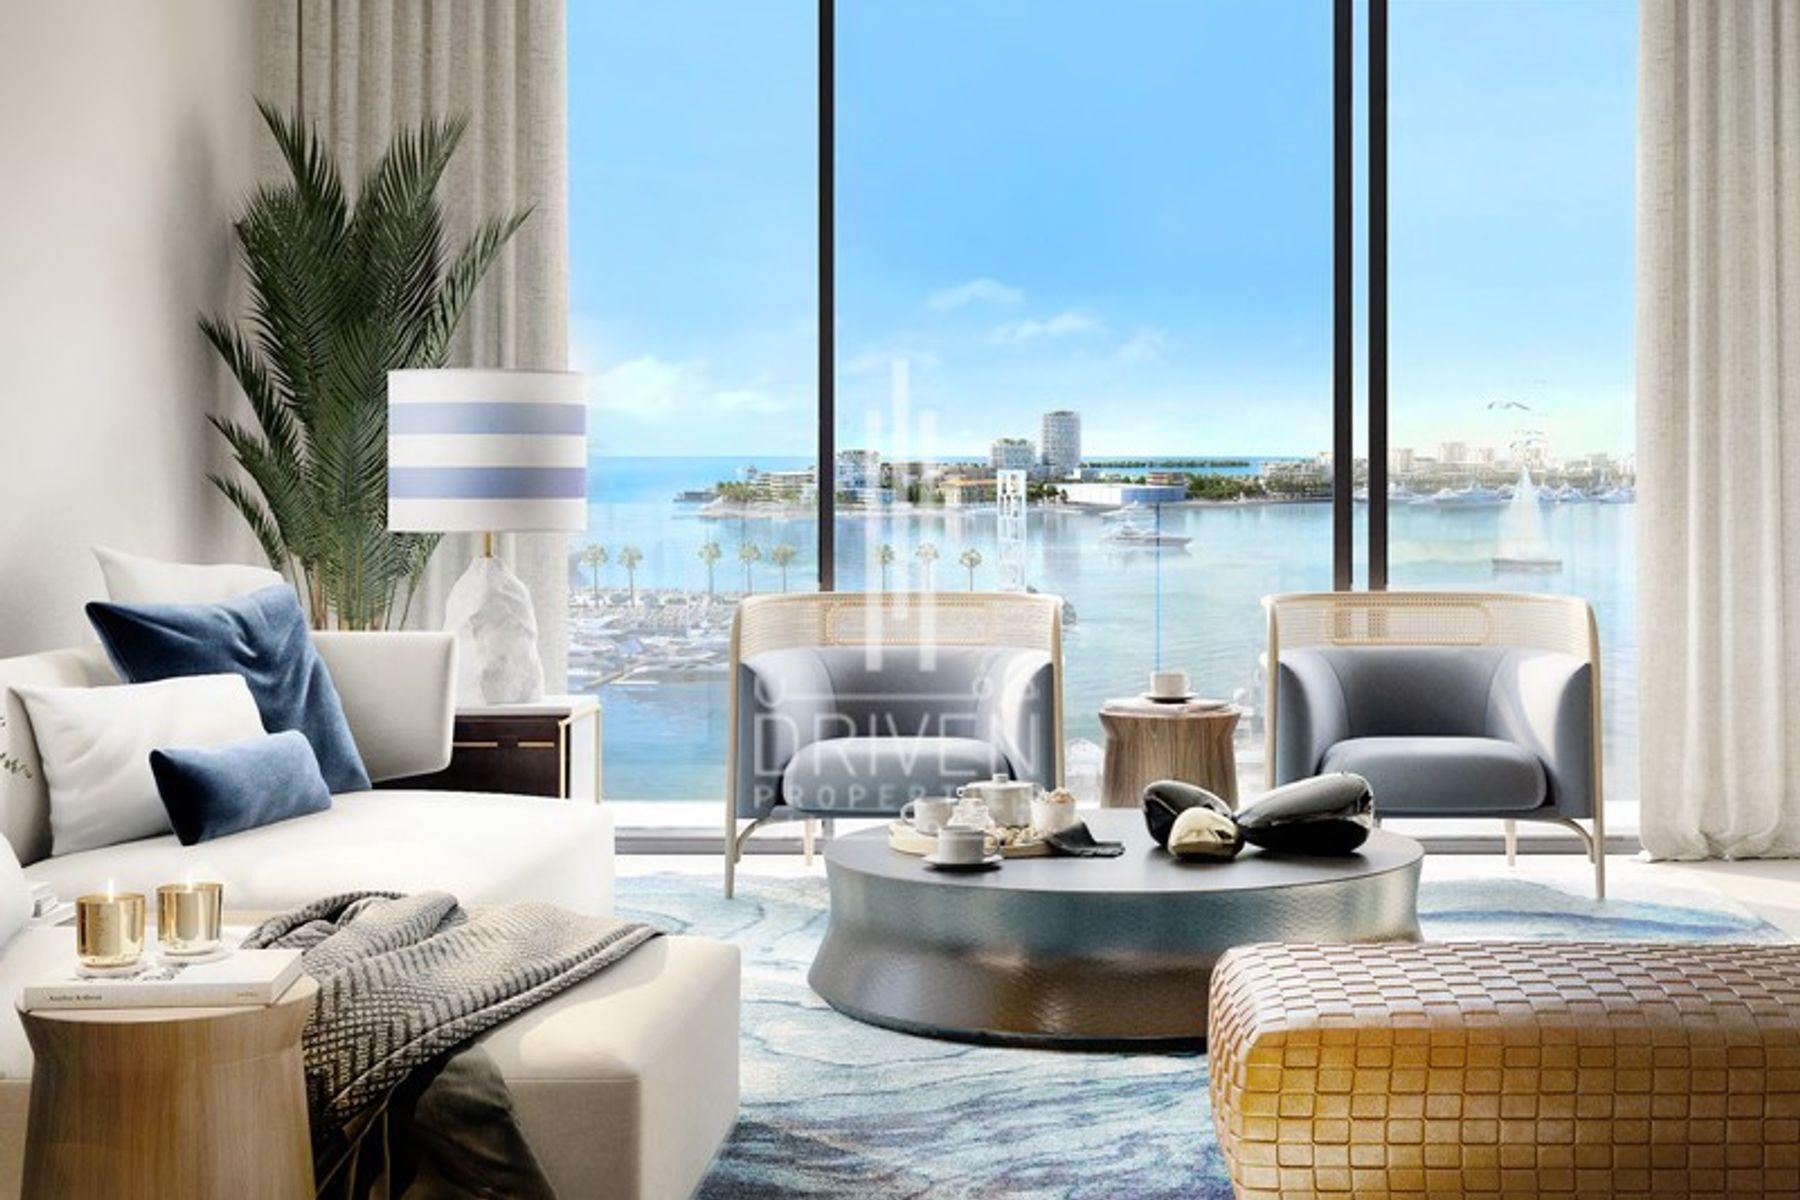 Apartment for Sale in Sirdhana - Mina Rashid